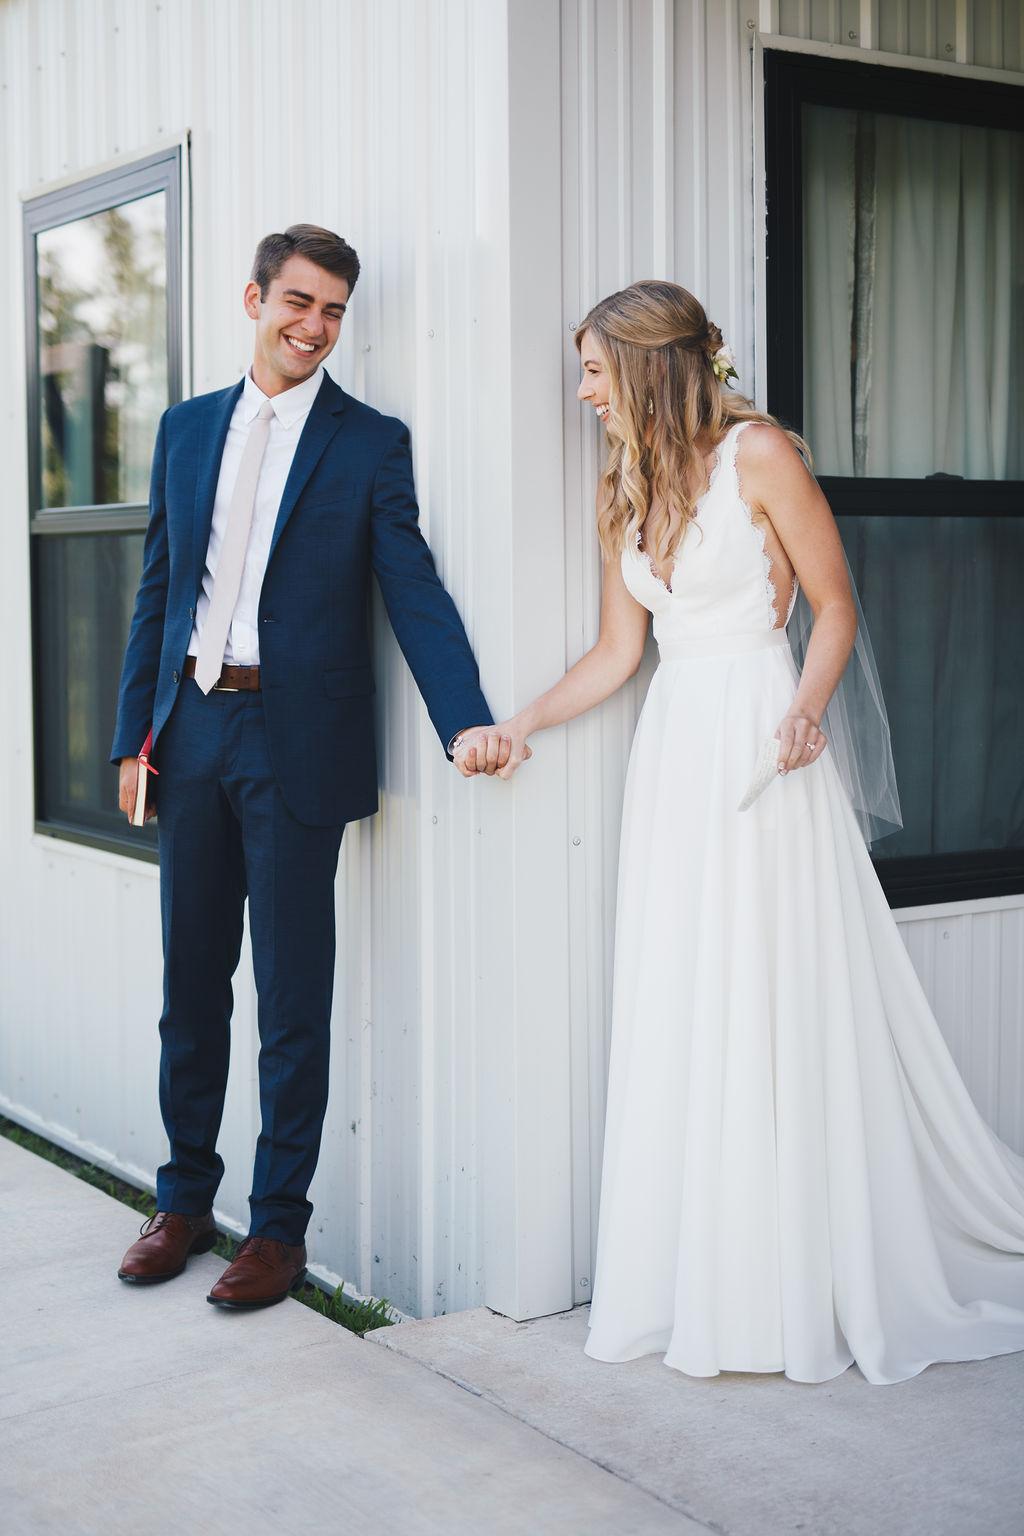 Bixby White Barn Tulsa Wedding 39.jpg